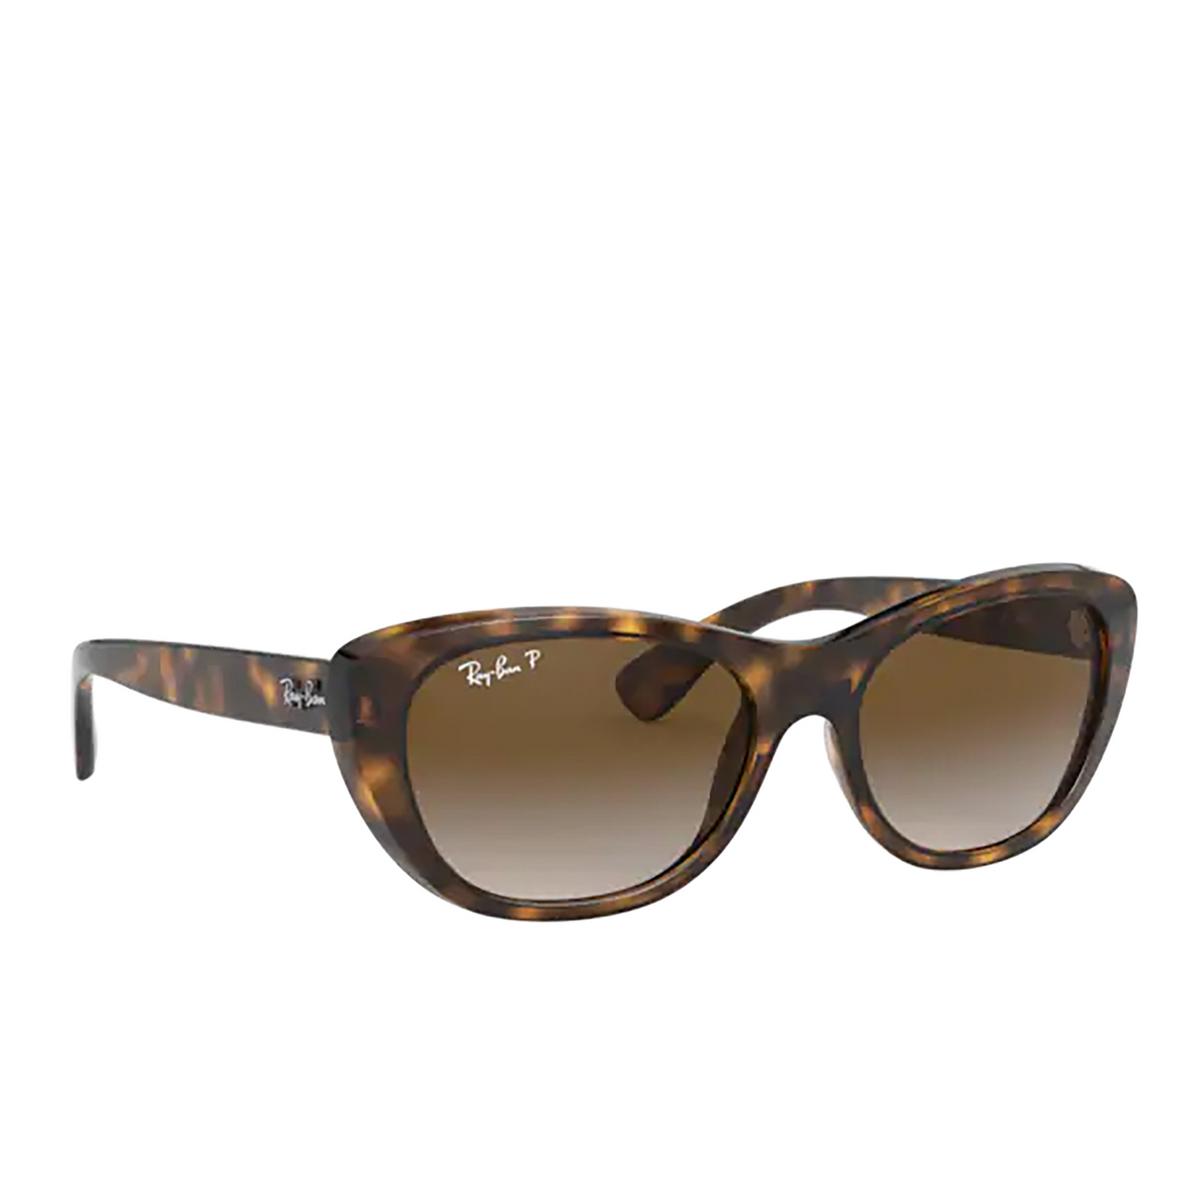 Ray-Ban® Square Sunglasses: RB4227 color Light Havana 710/T5 - 2/3.